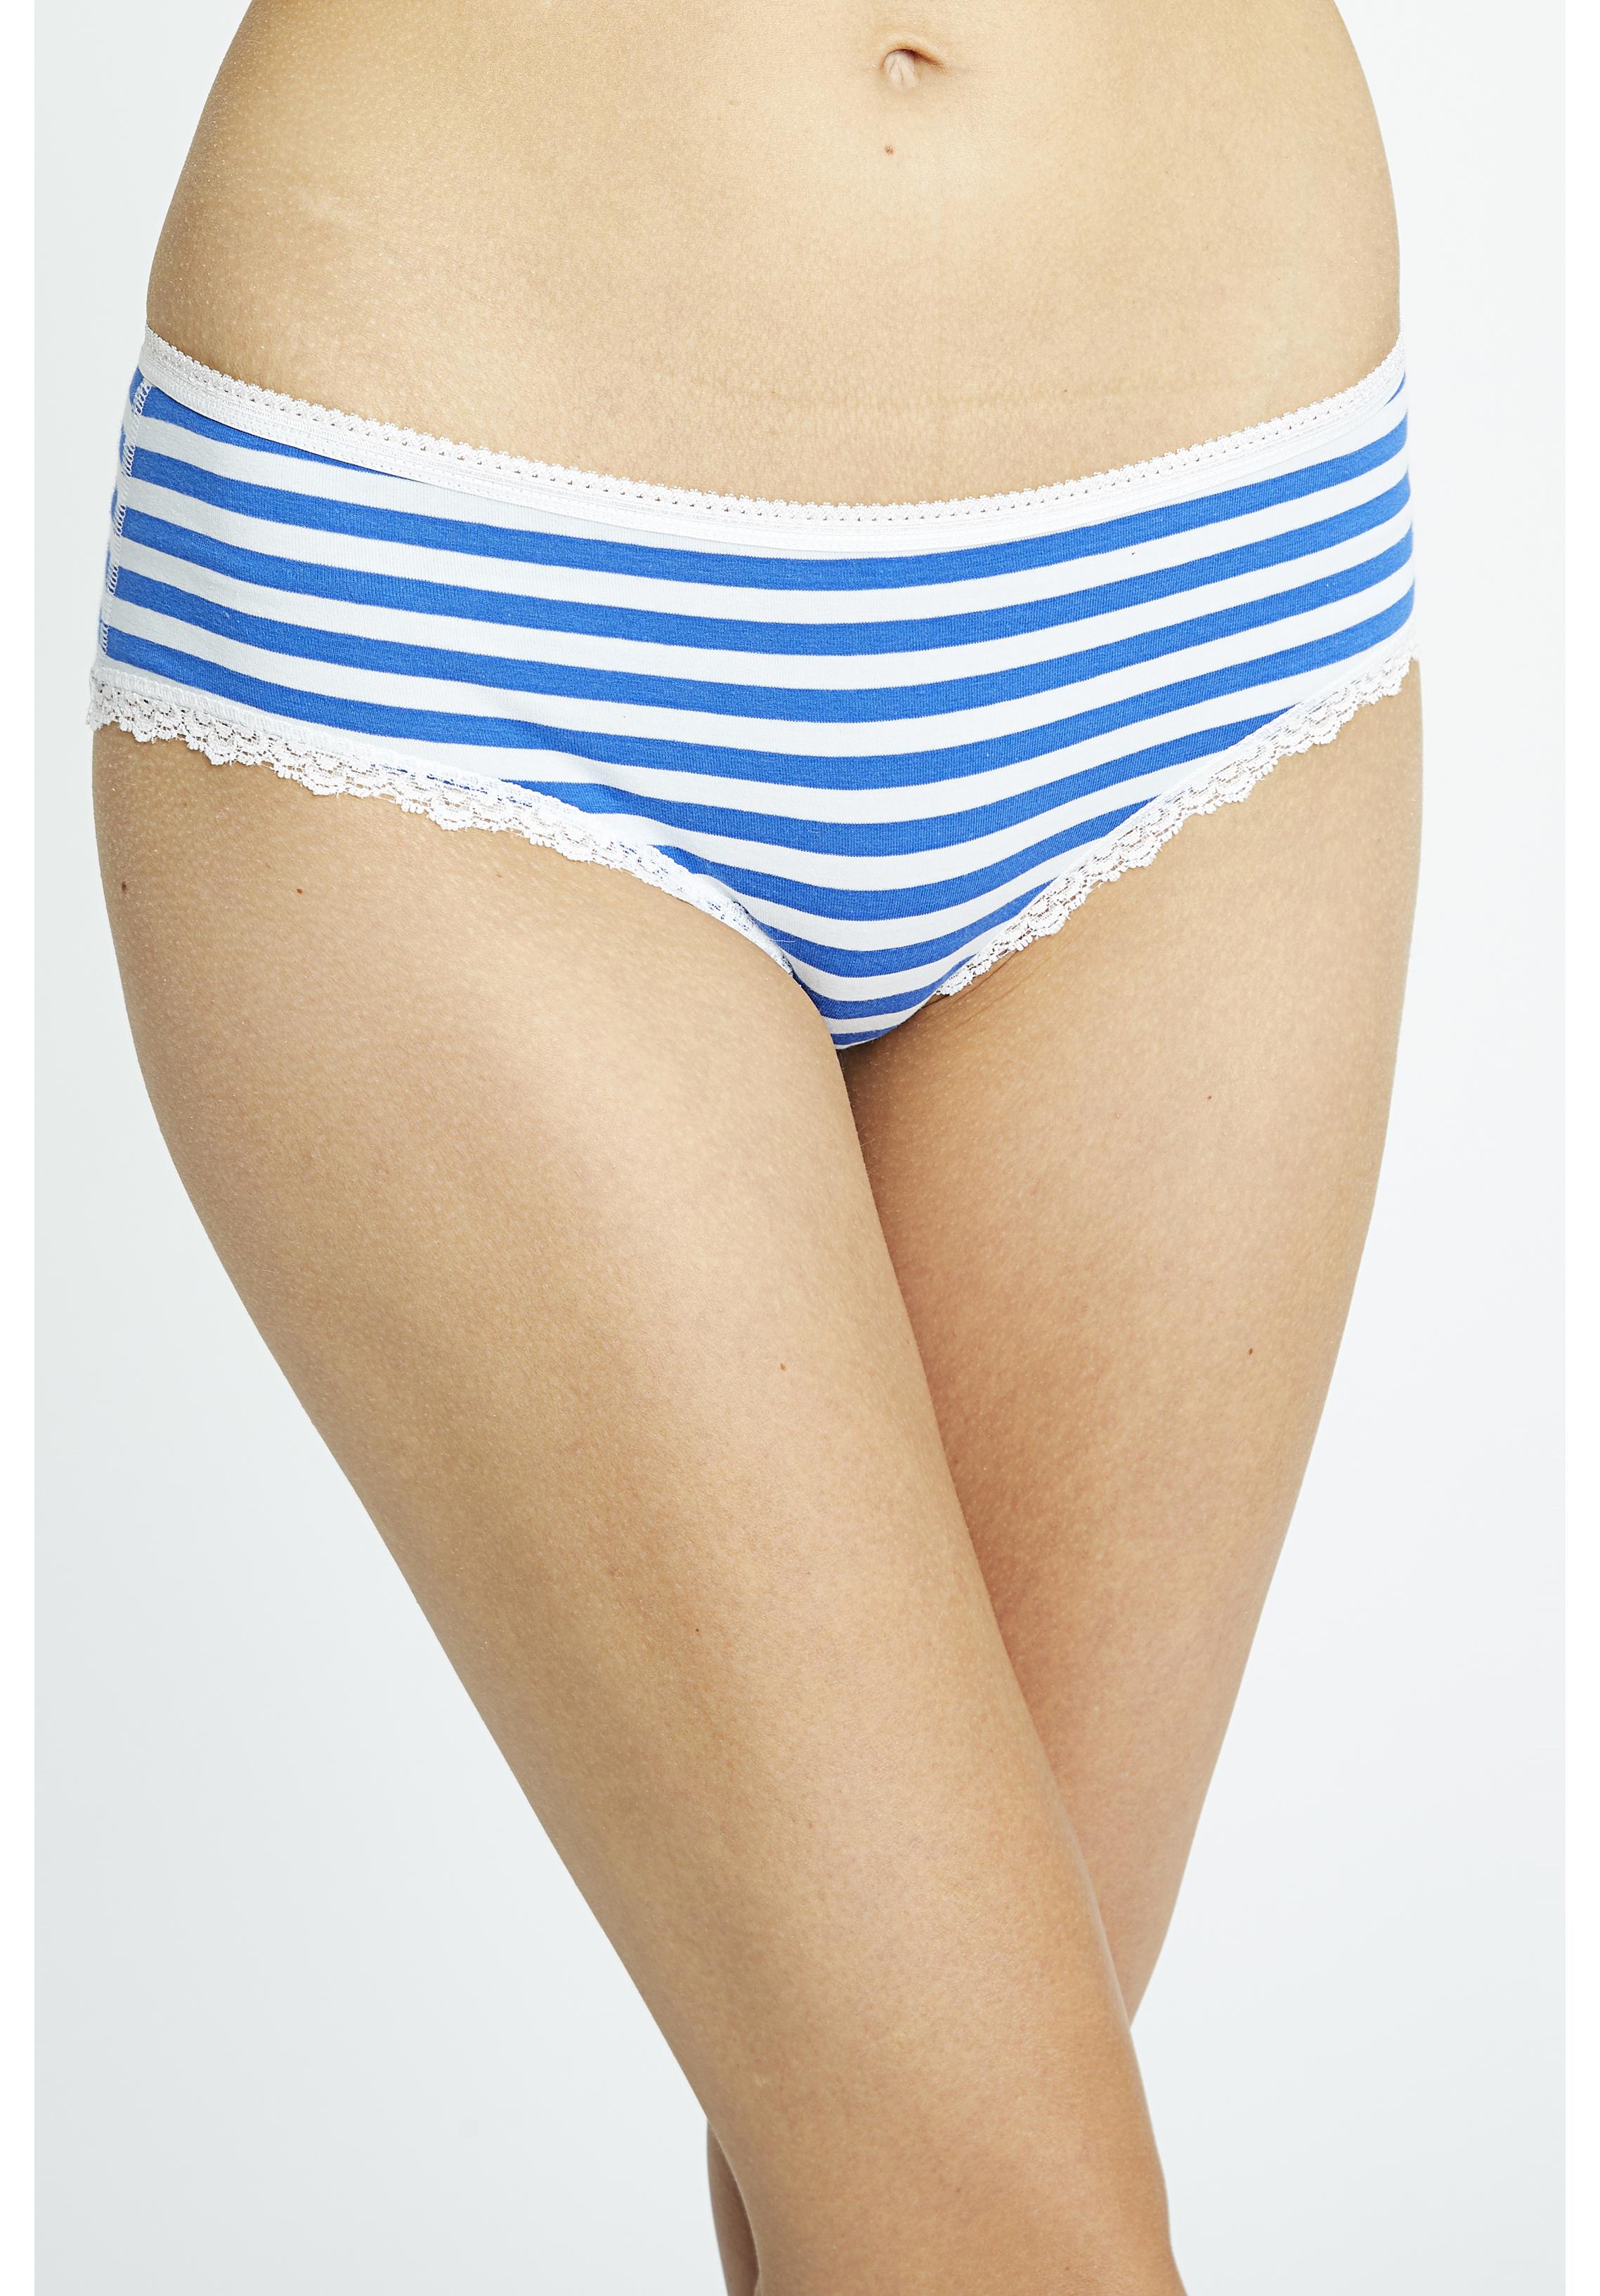 7c4eb97d3f UNDERWEAR - Stripe Lace Hipster in Light Blue